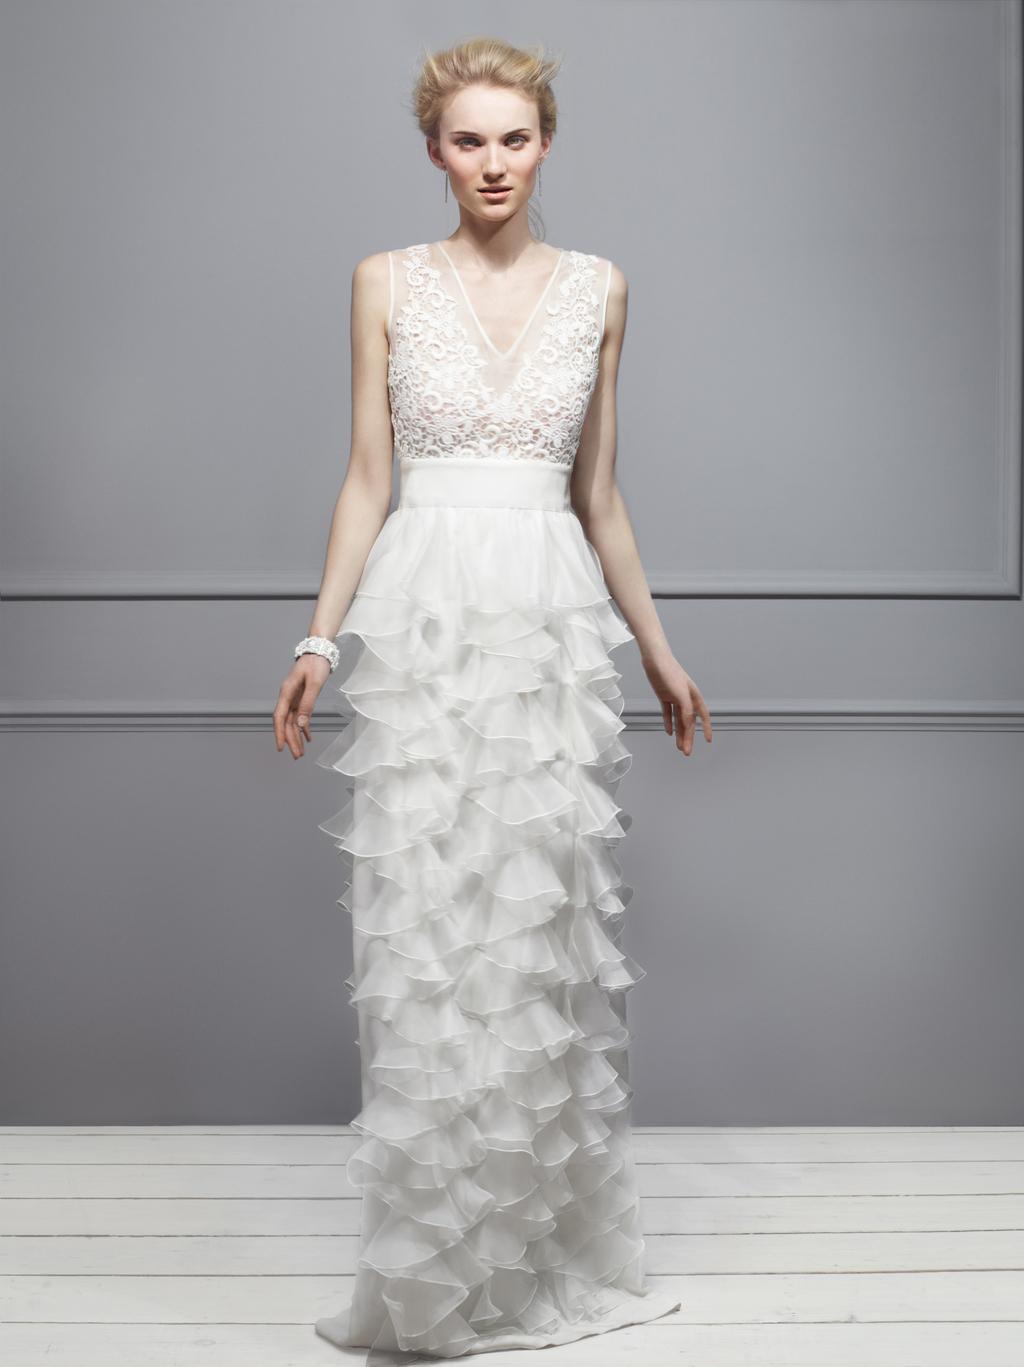 Giambattista-valli-wedding-dress-2013-exclusive-bridal-designer-collection-from-net-a-porter.full